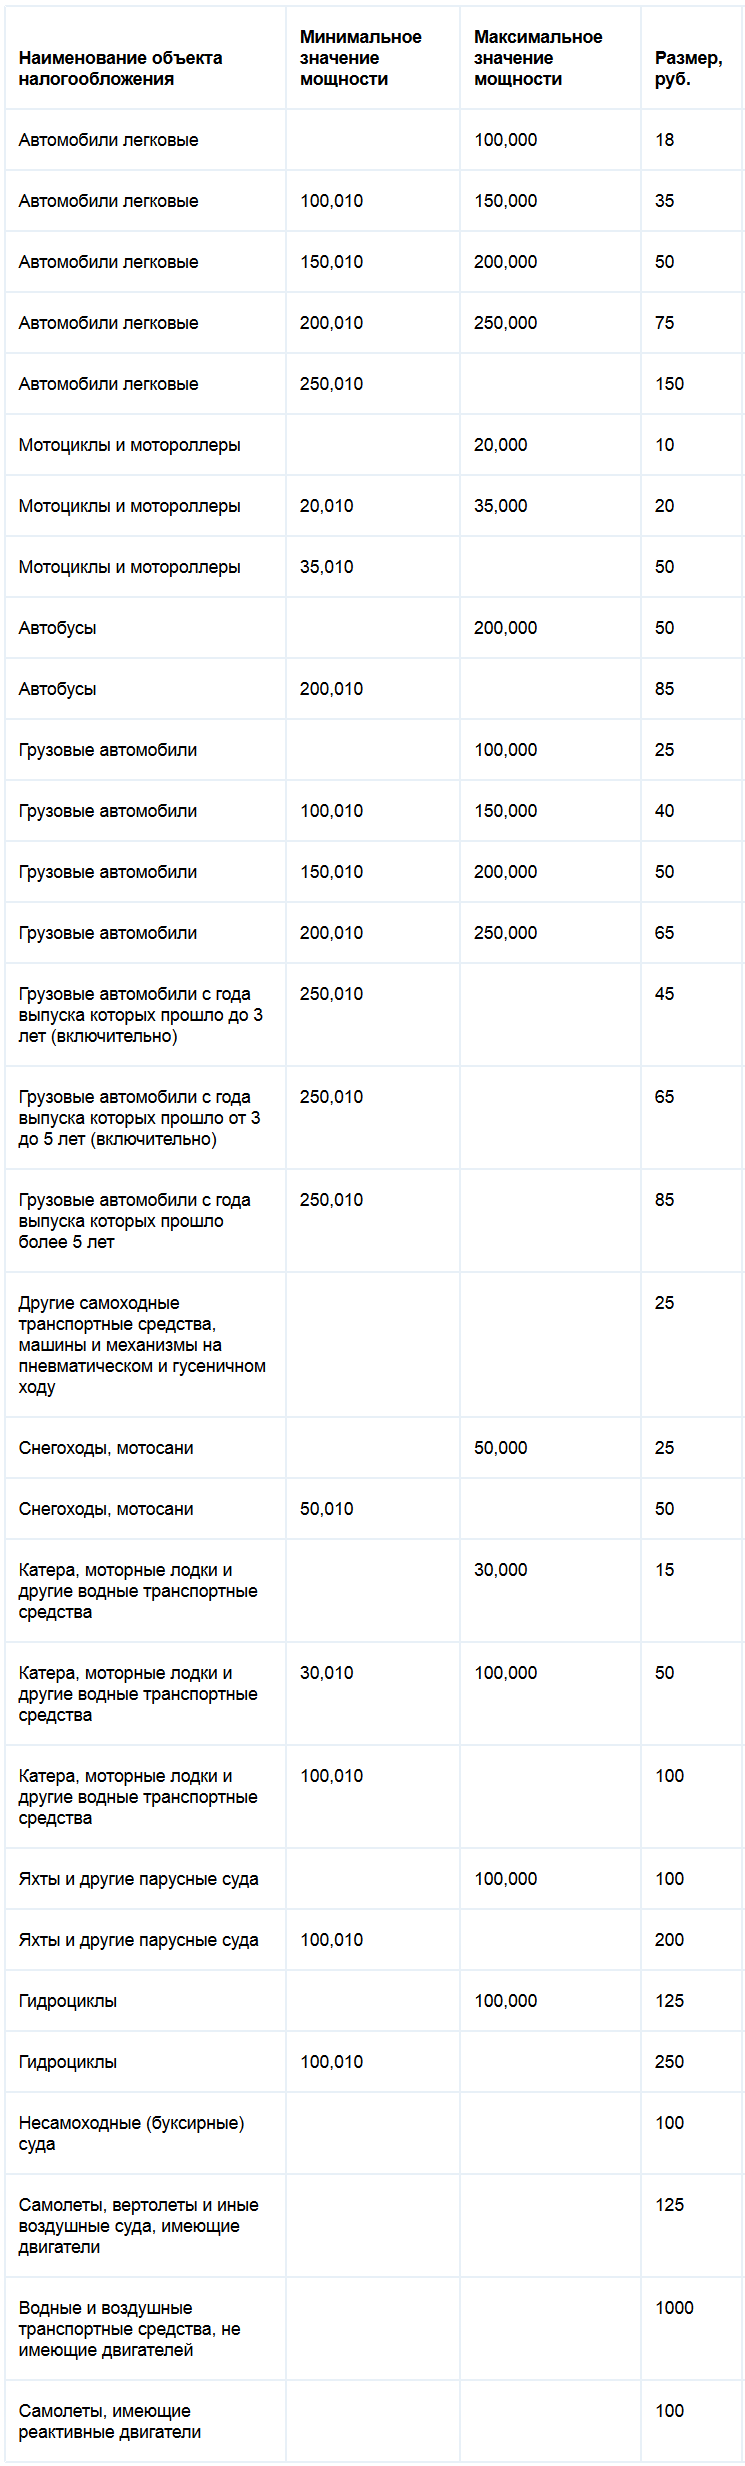 Ставки транспортного налога Ленинградской области